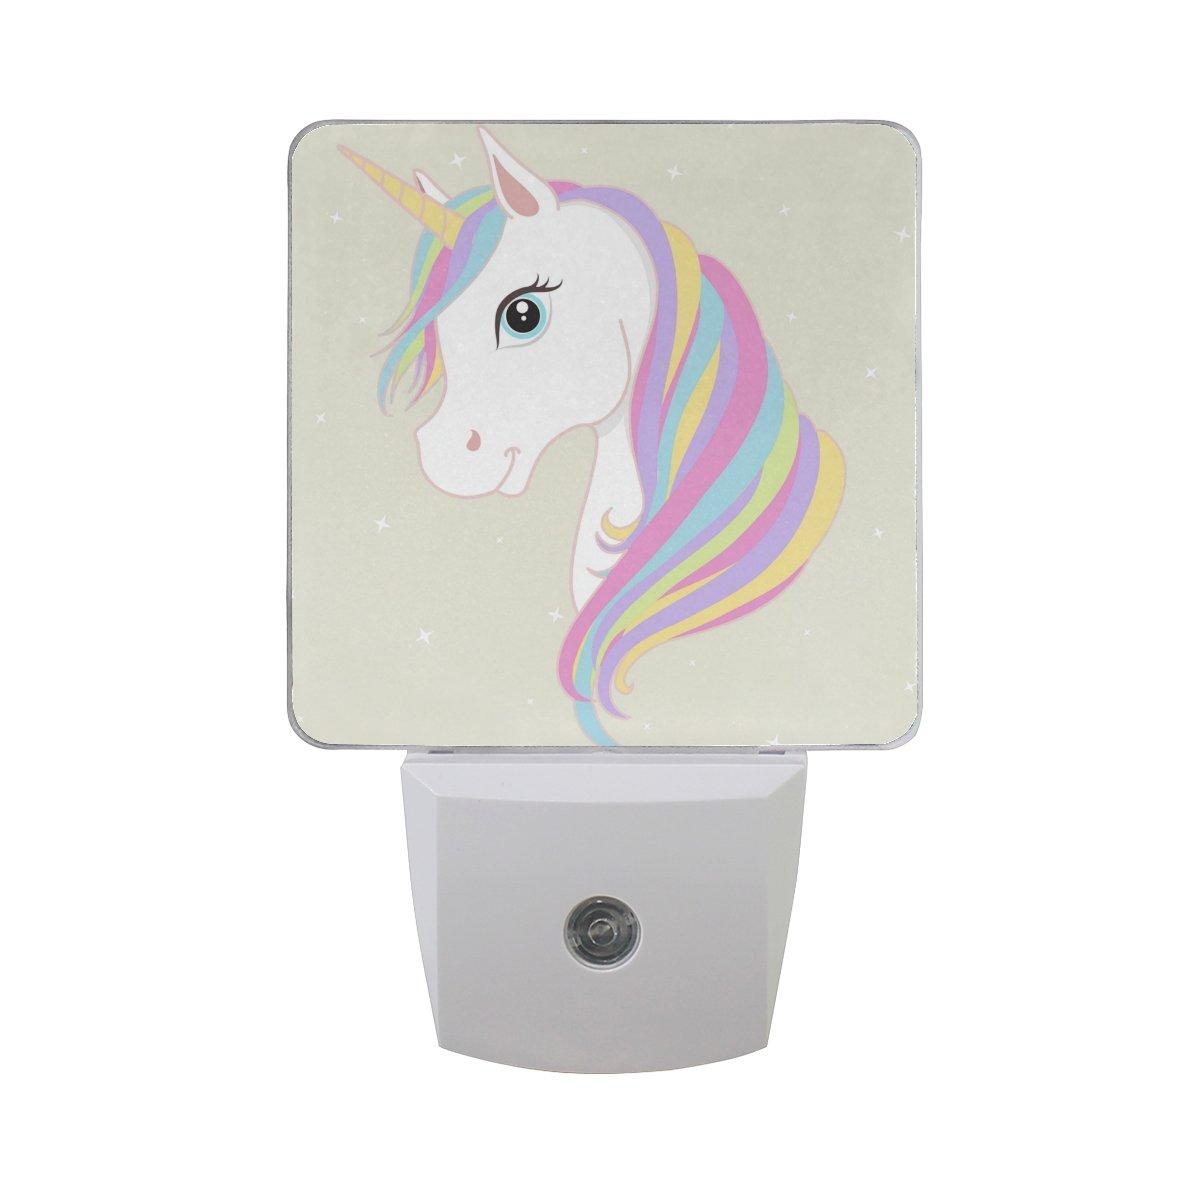 Plug in led night light lamp white unicorn printing with dusk to dawn sensor for bedroom bathroom hallway stairways 0 5w 2 pack amazon com